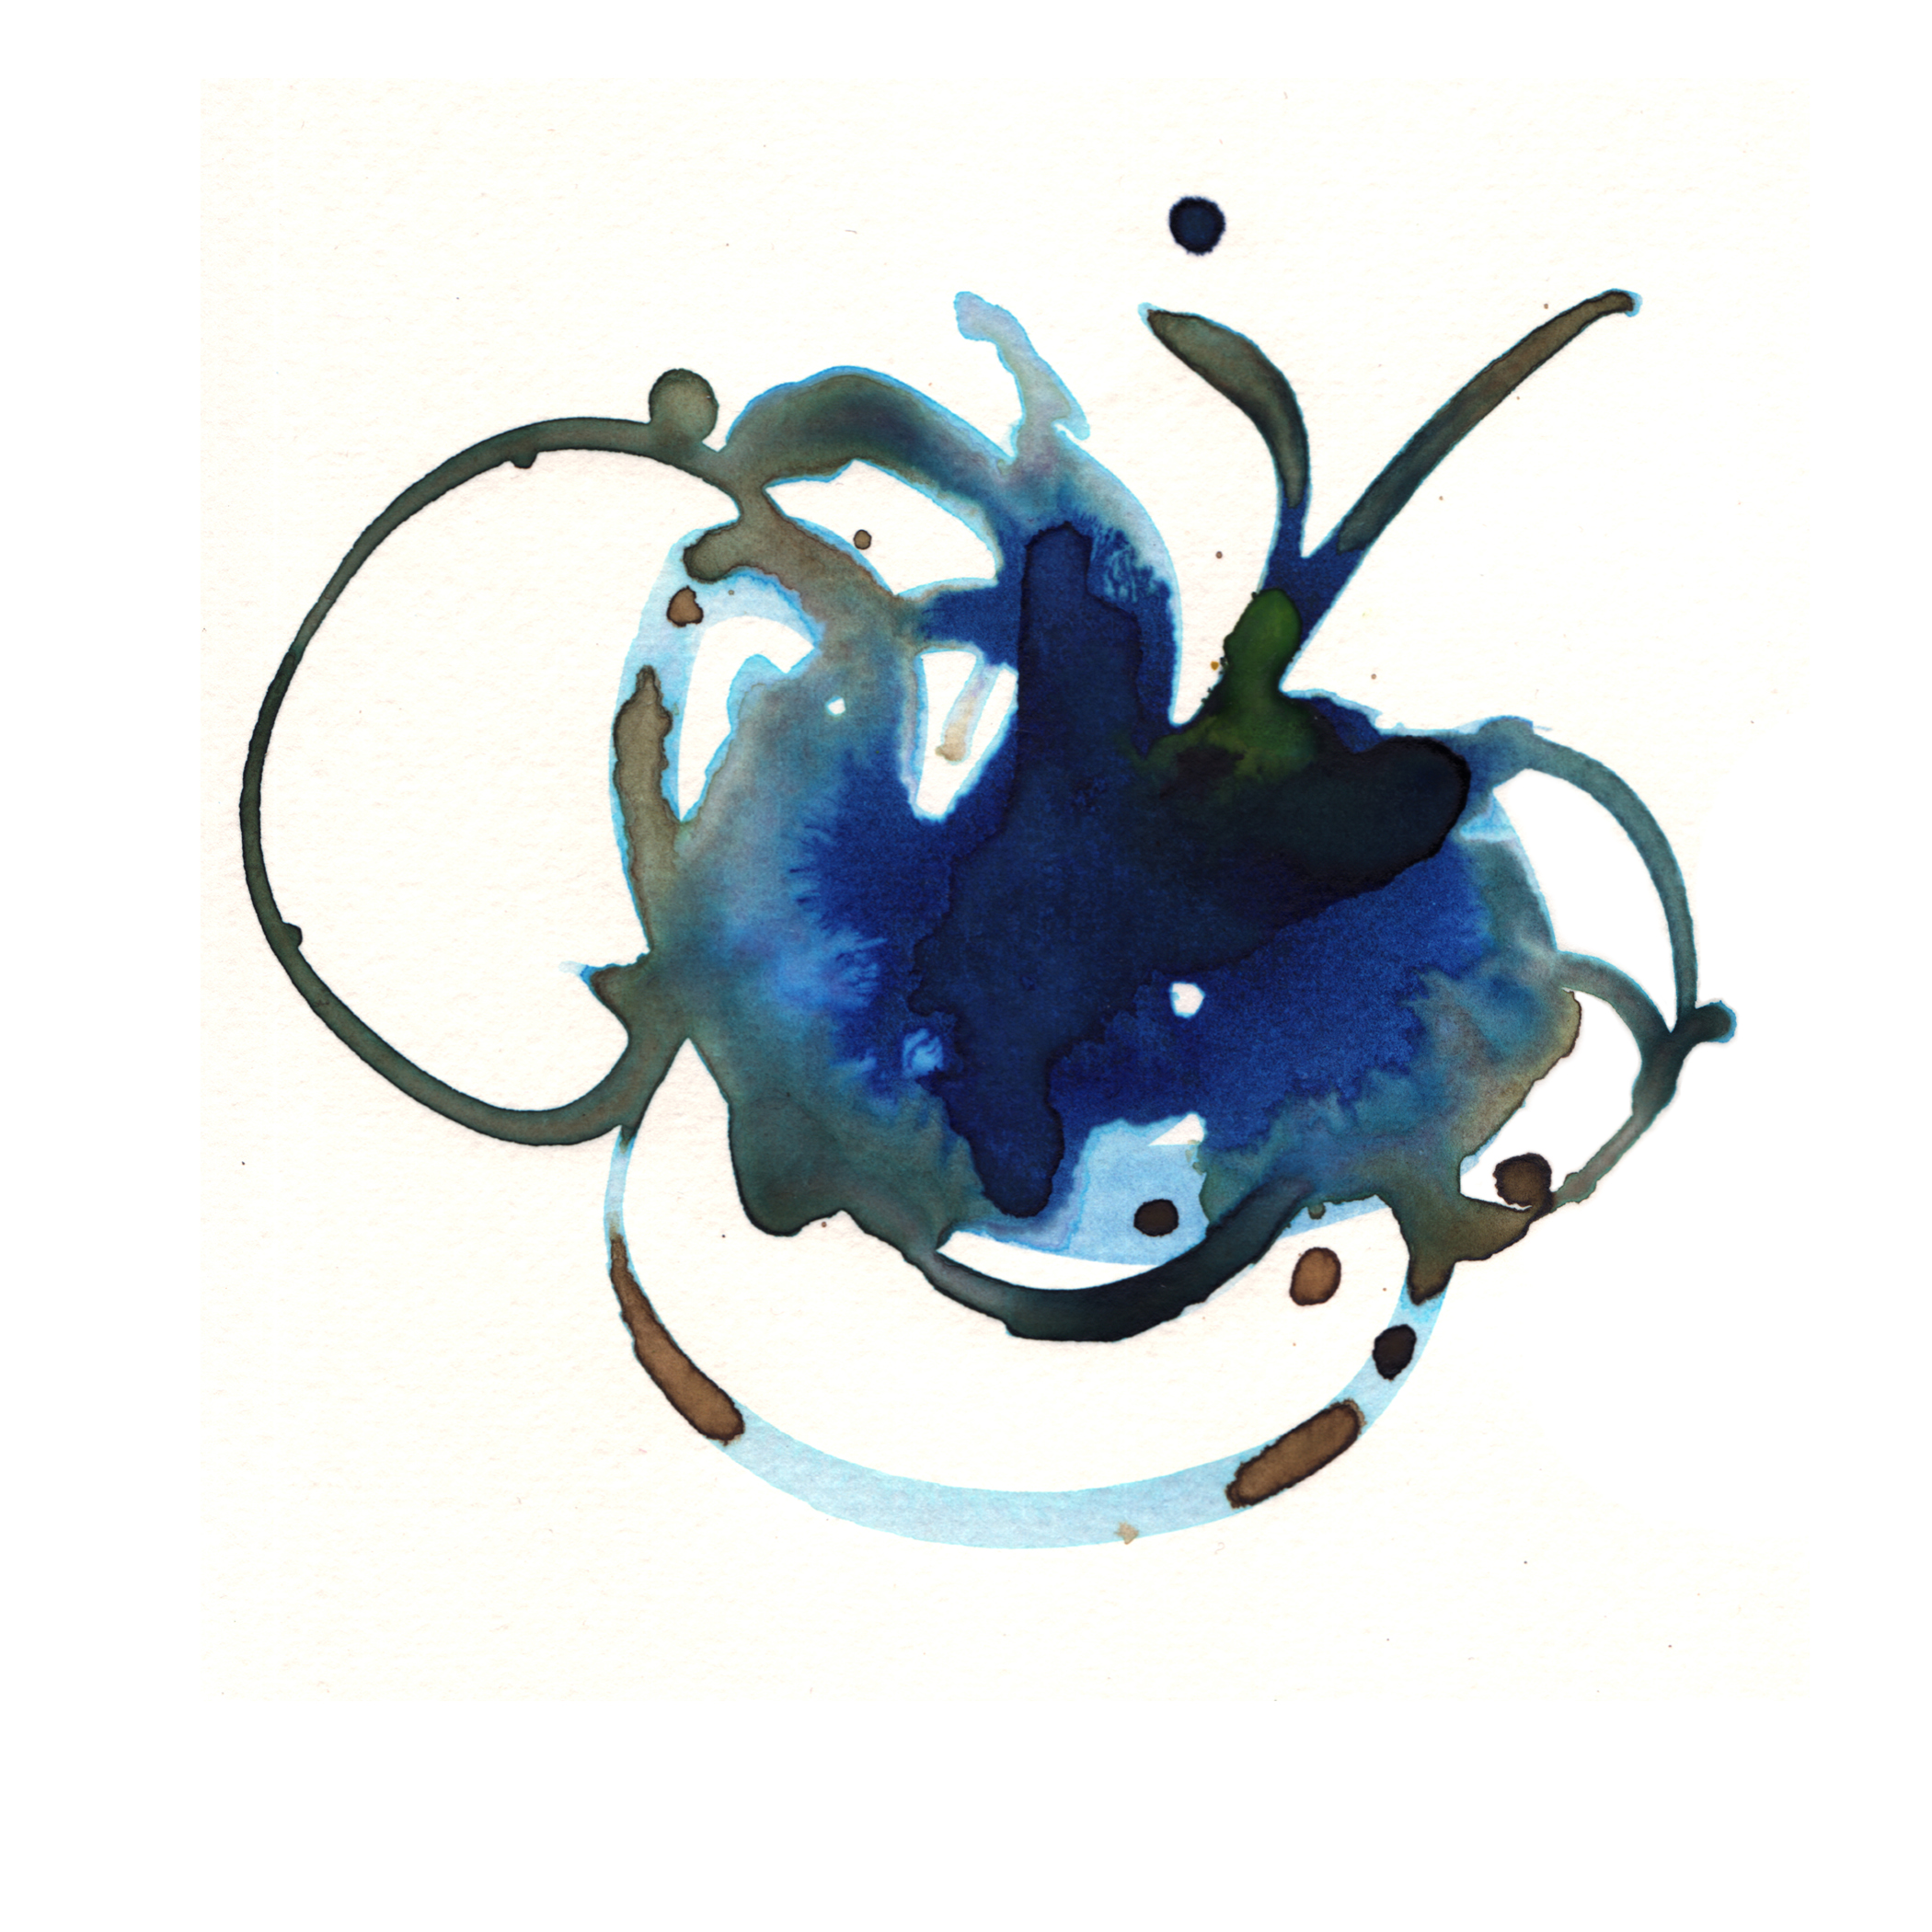 45.Blue.Lily.3.25.14.jpg